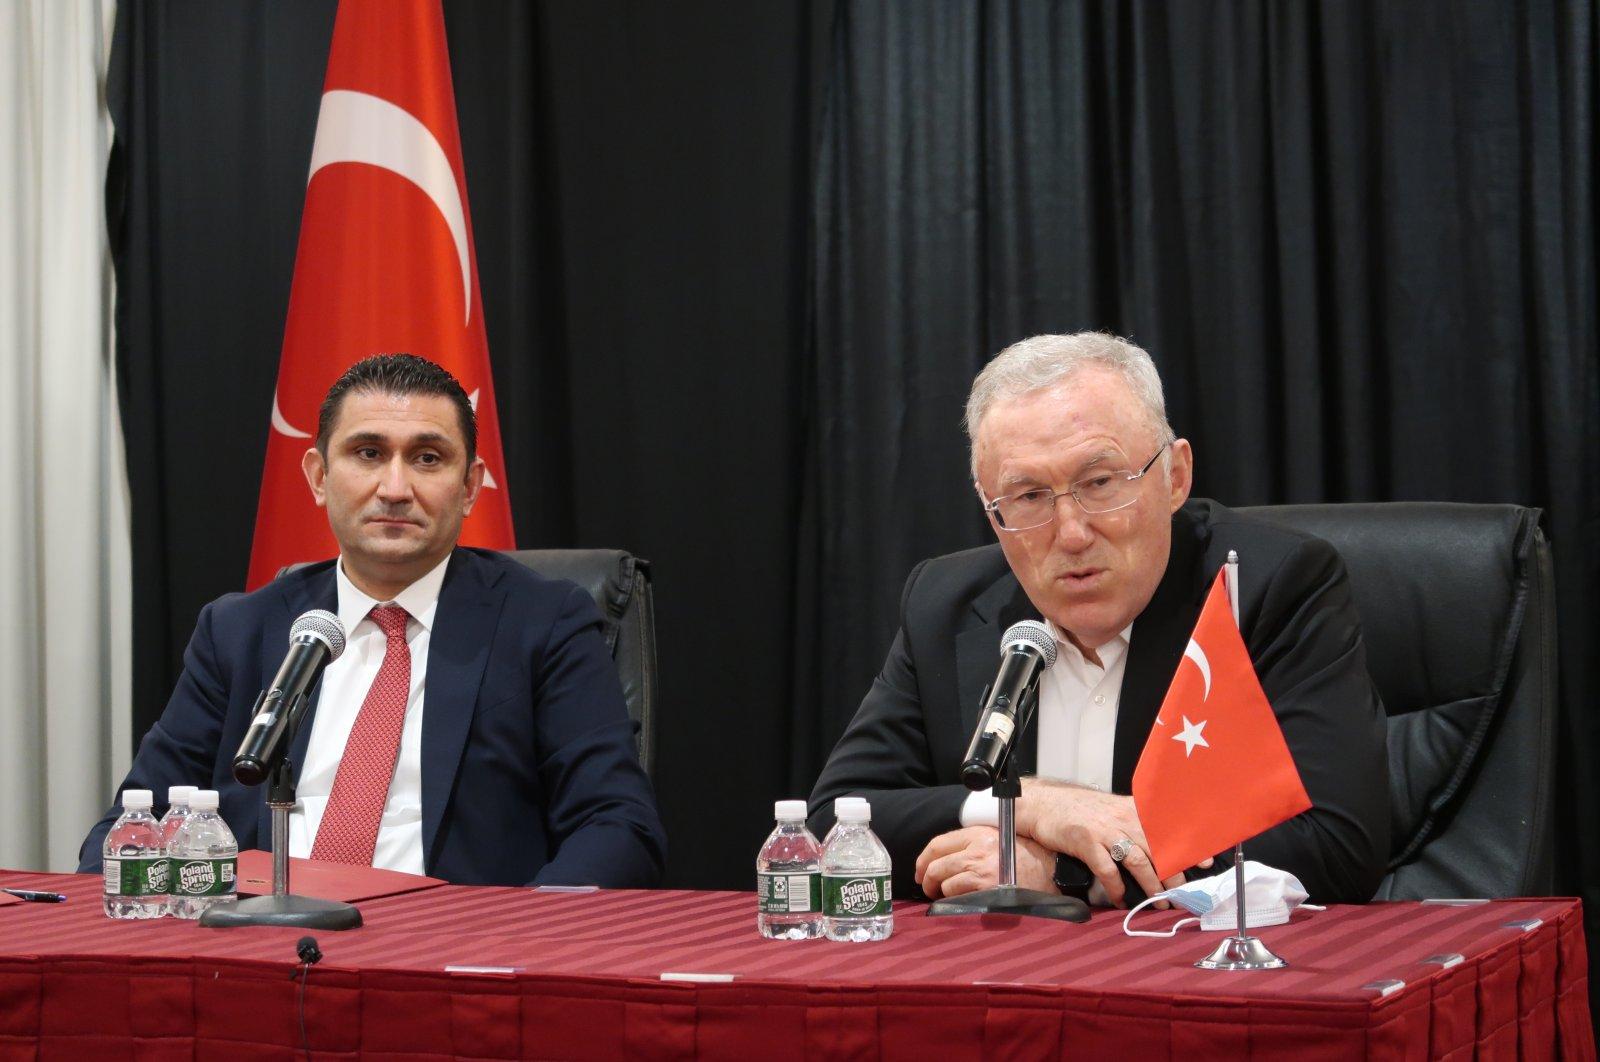 Turkey's new ambassador to Washington (R) addresses representatives of Turkish nongovernmental organizations (NGOs) and members of the Turkish community in New York, U.S., April 9, 2021. (AA)